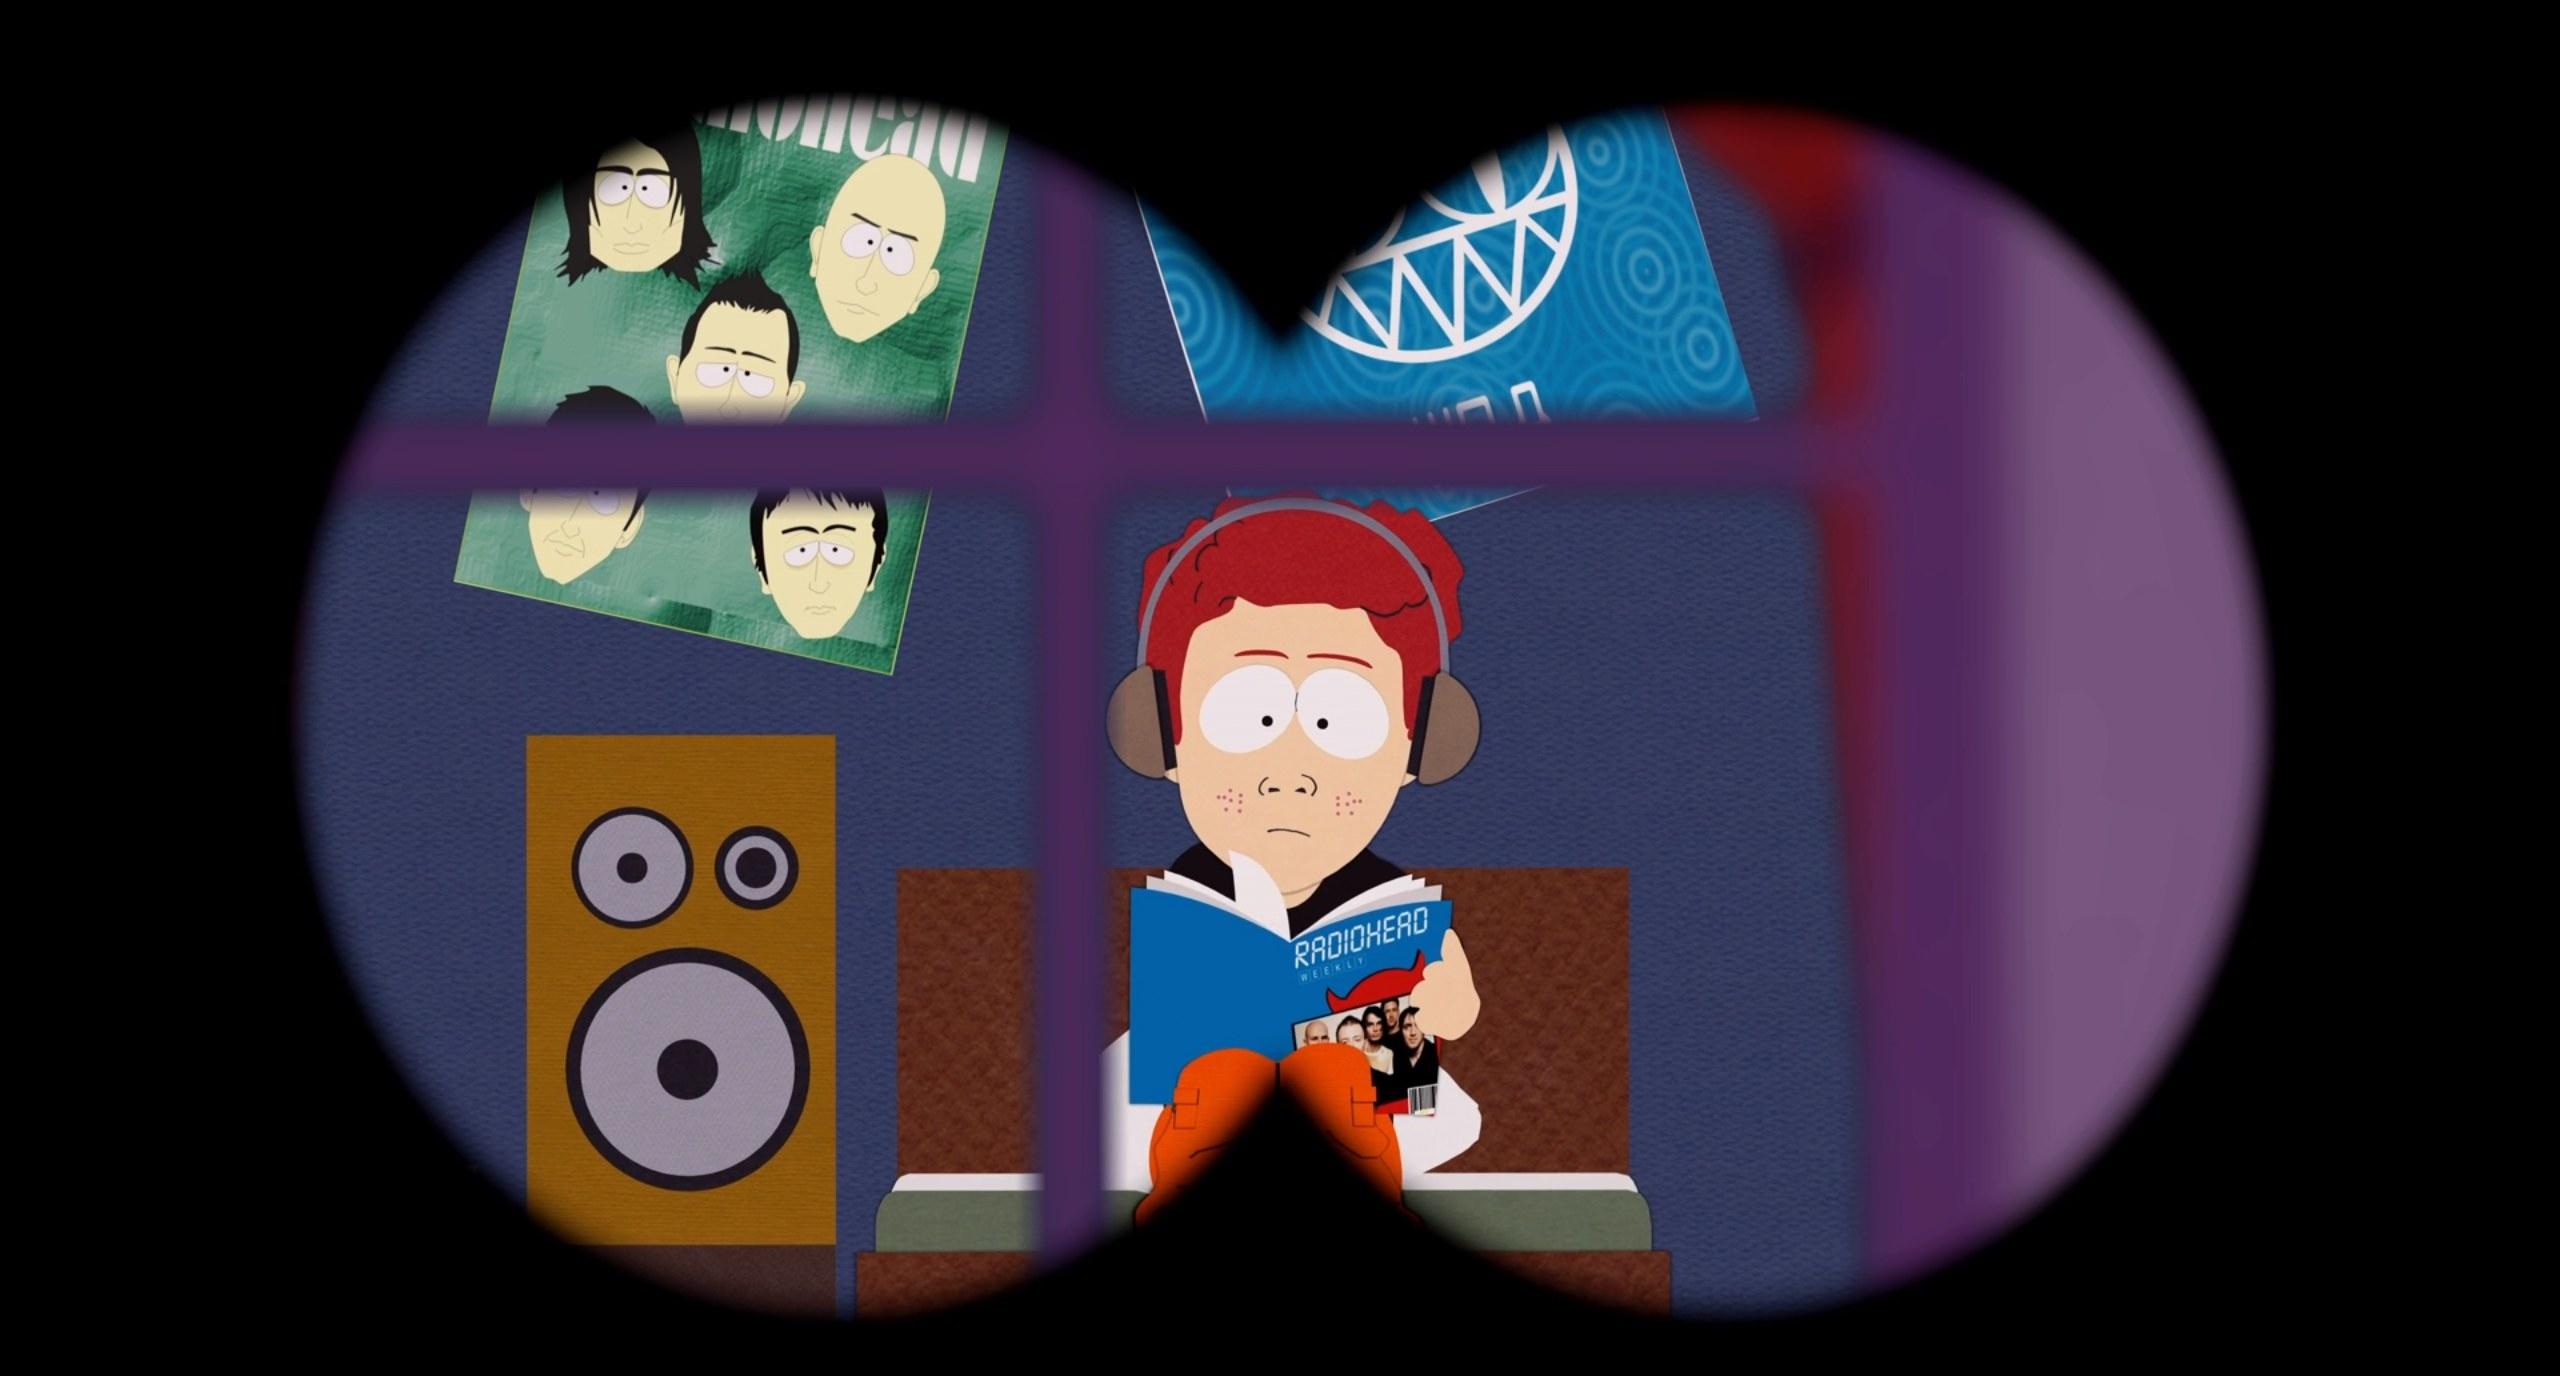 Cartman watches Scott Tenorman